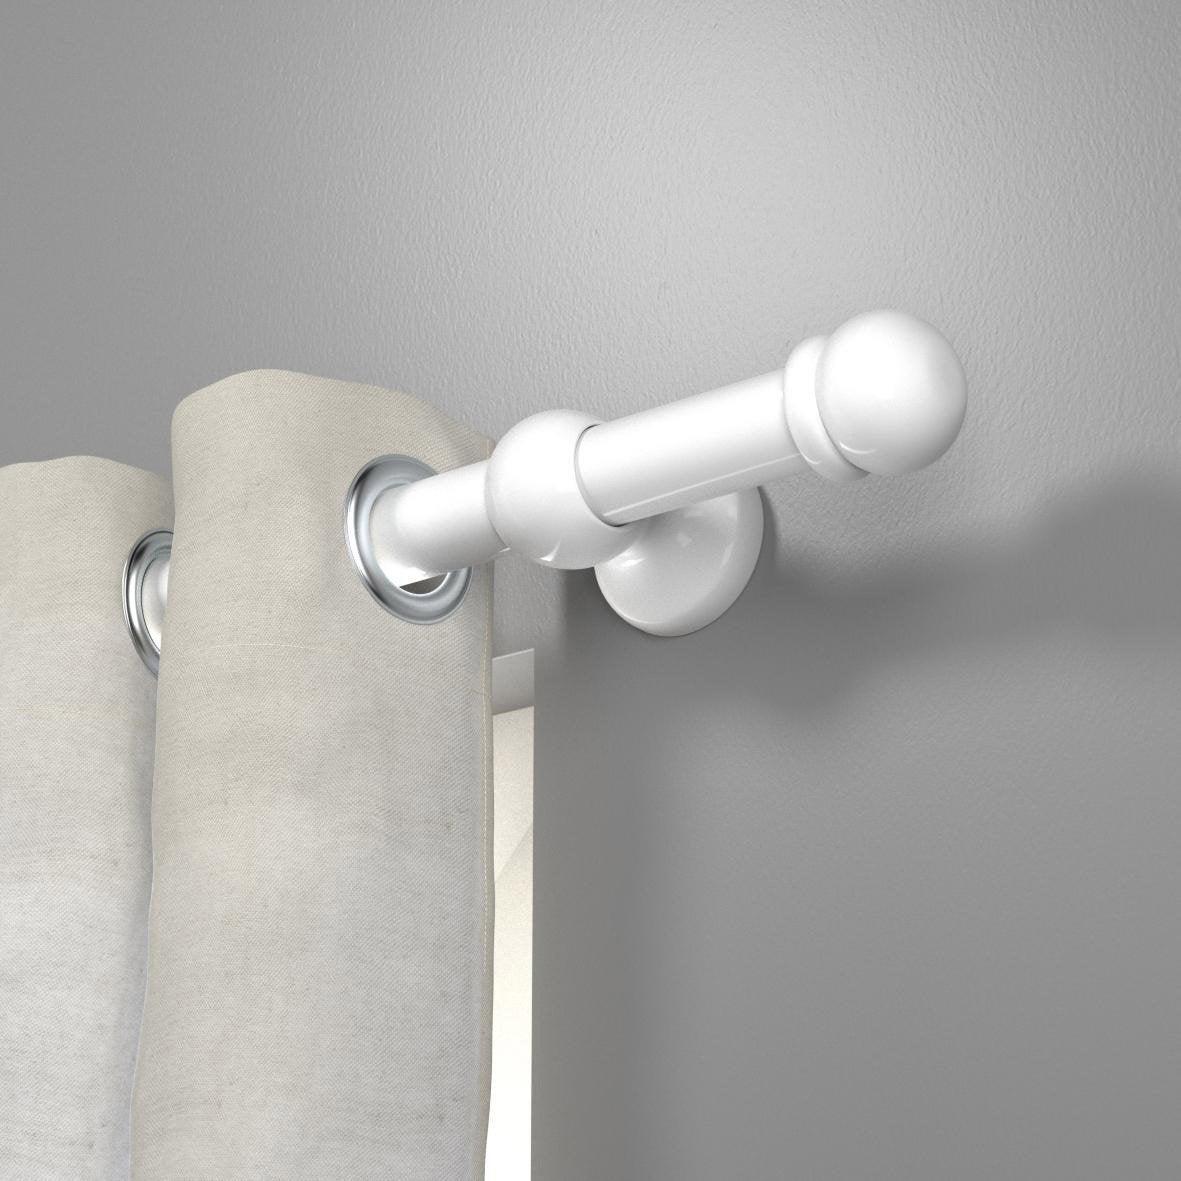 Support tringle à rideau, 28 mm blanc brillant INSPIRE   Leroy Merlin